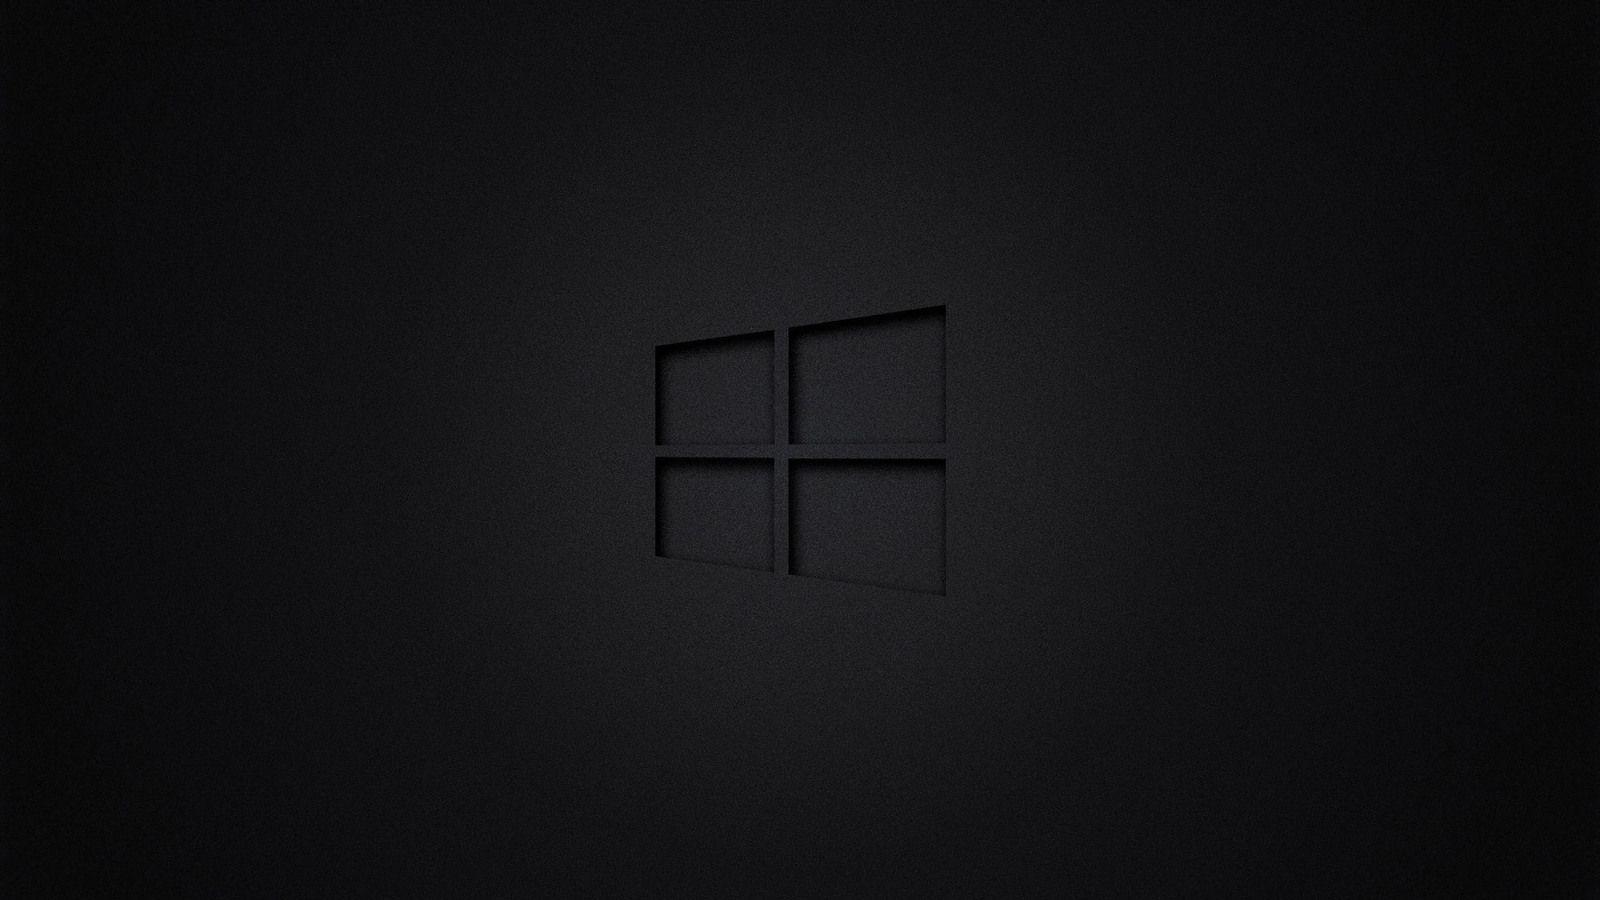 1600 X 900 Black Wallpapers Top Free 1600 X 900 Black